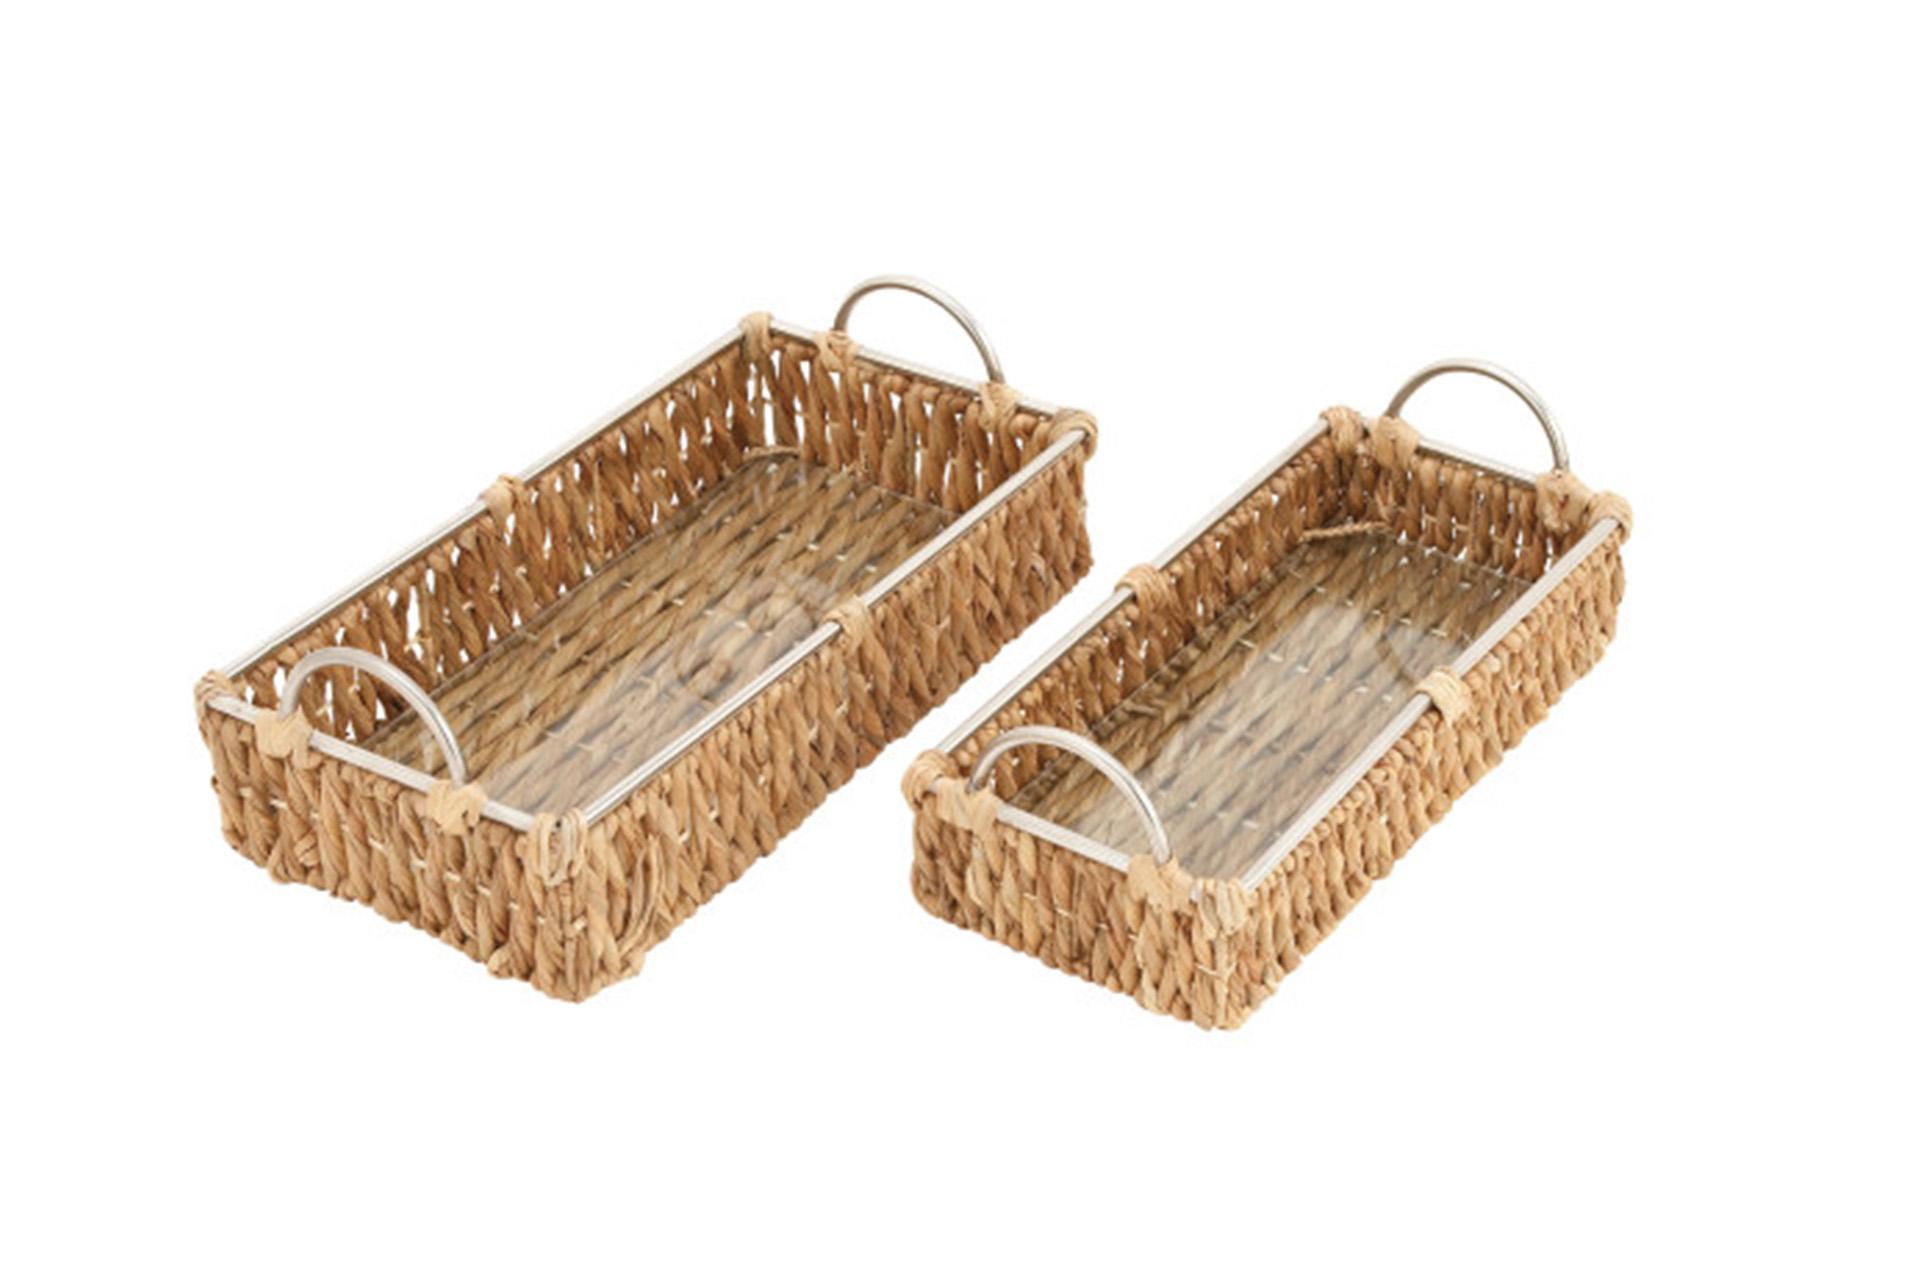 2 Piece Set Wicker u0026 Metal Long Baskets  sc 1 st  Living Spaces & Decorative Baskets to Fit Your Home Decor | Living Spaces